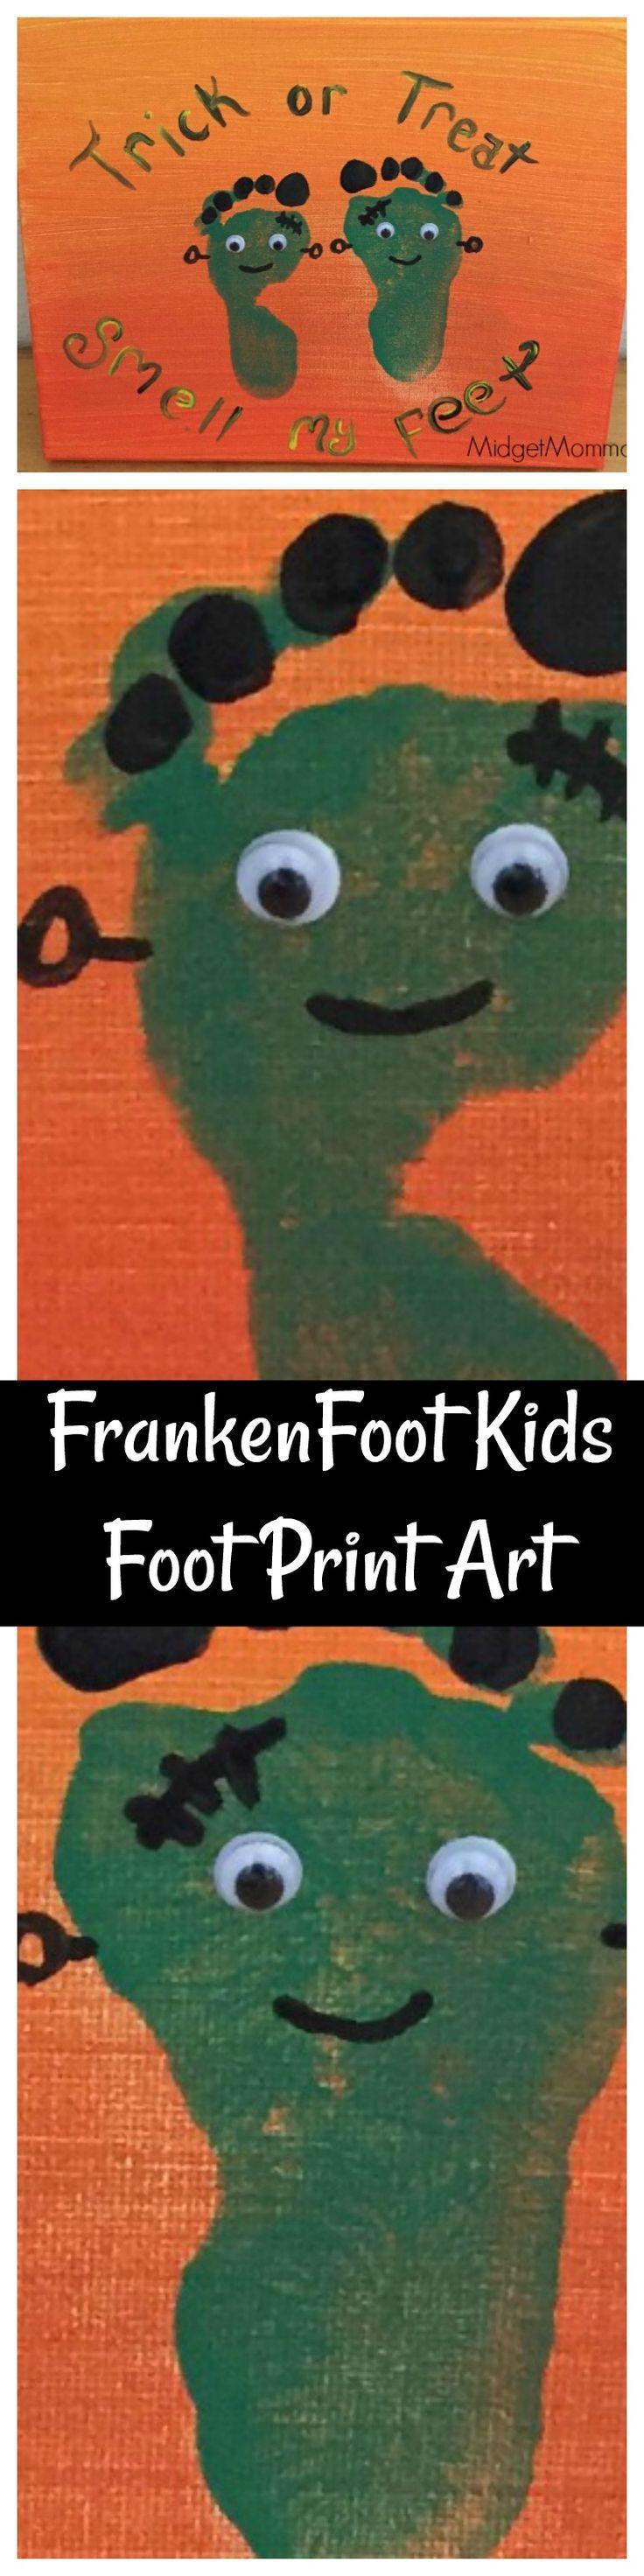 Avalisa letter upper case t stretched wall art - Frankenfoot Kids Foot Print Art Halloween Craft